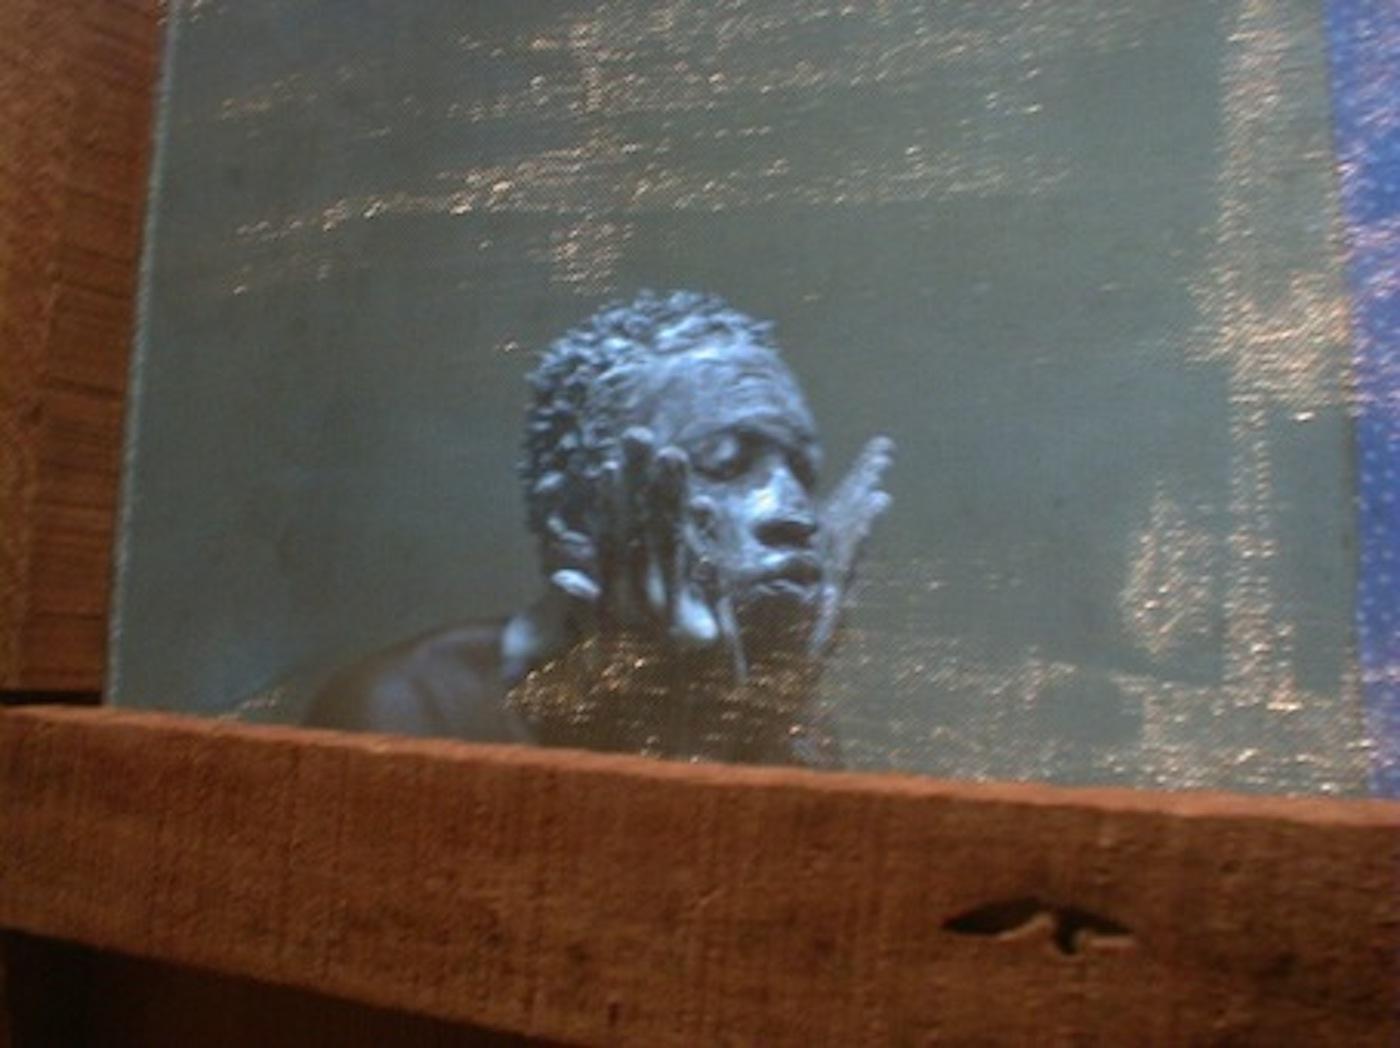 "Mohamed Camara, ""Certains matins, je n'ai pas le courage d'aller á la salle de bain"", 2006/7, c-print, 48 x 58 (framed)"